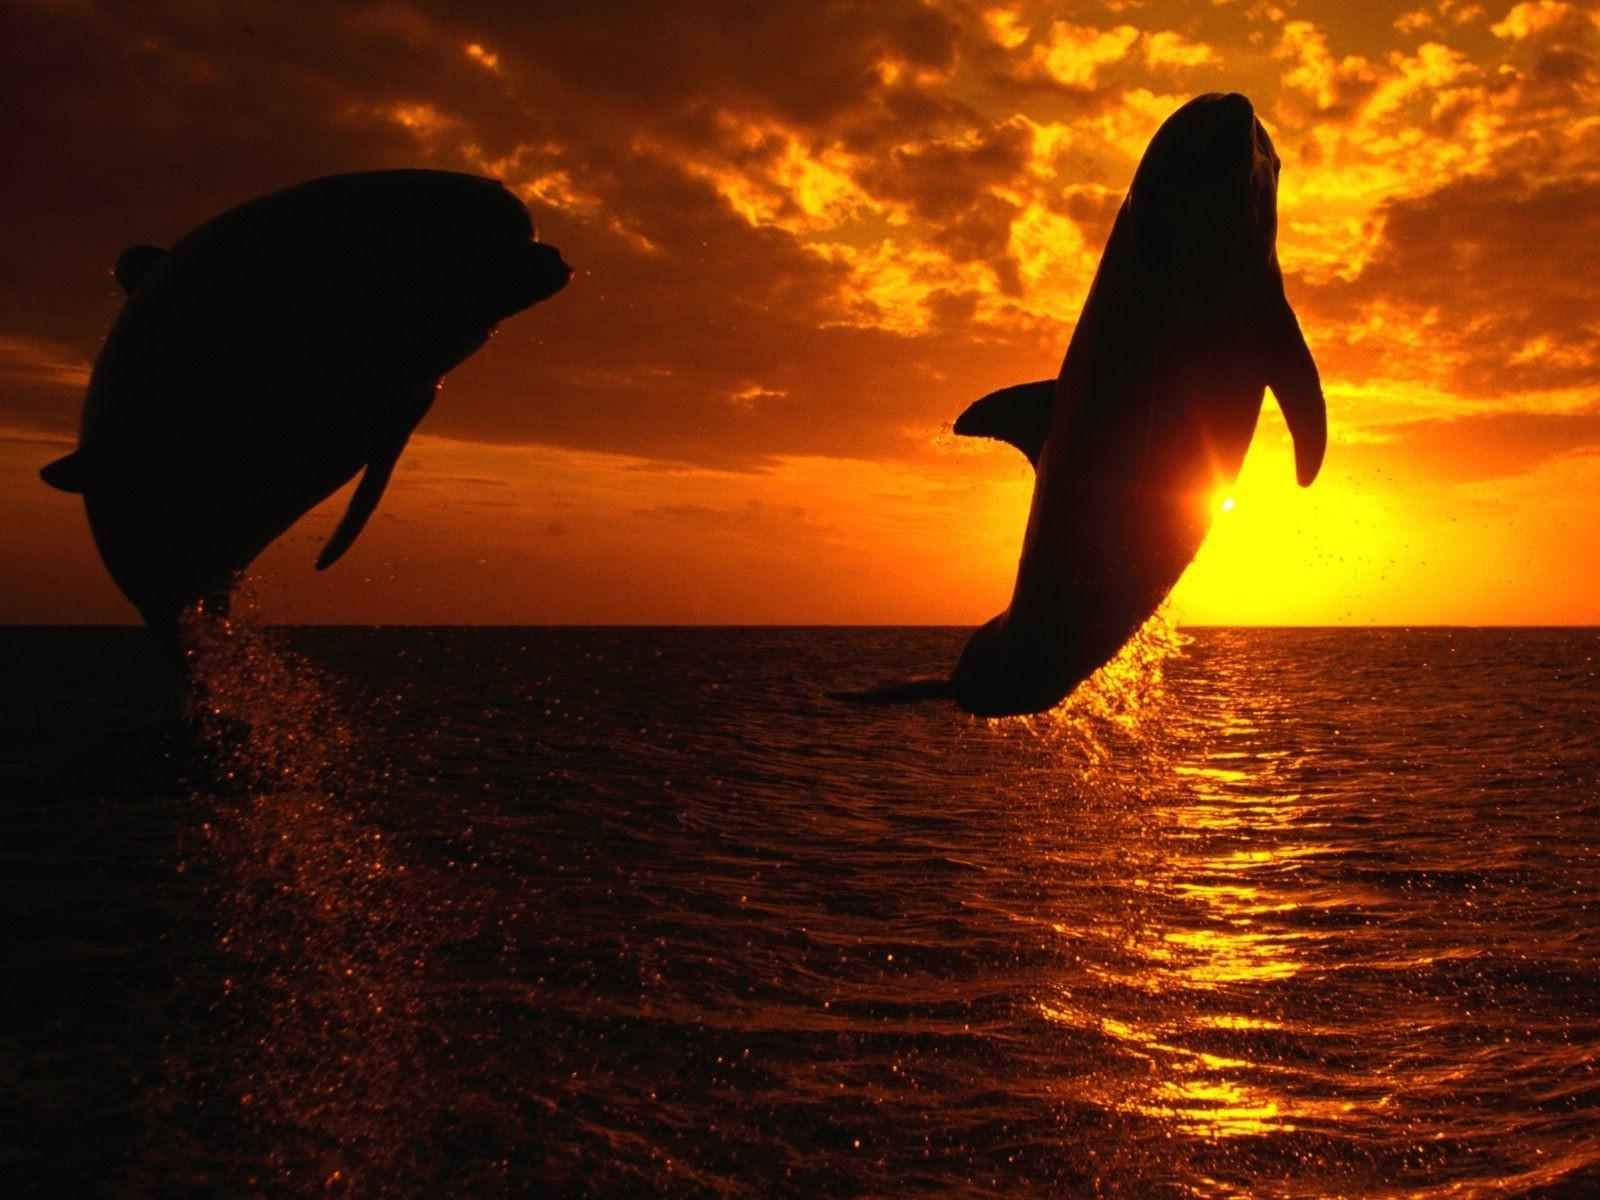 Дельфин море закат картинка